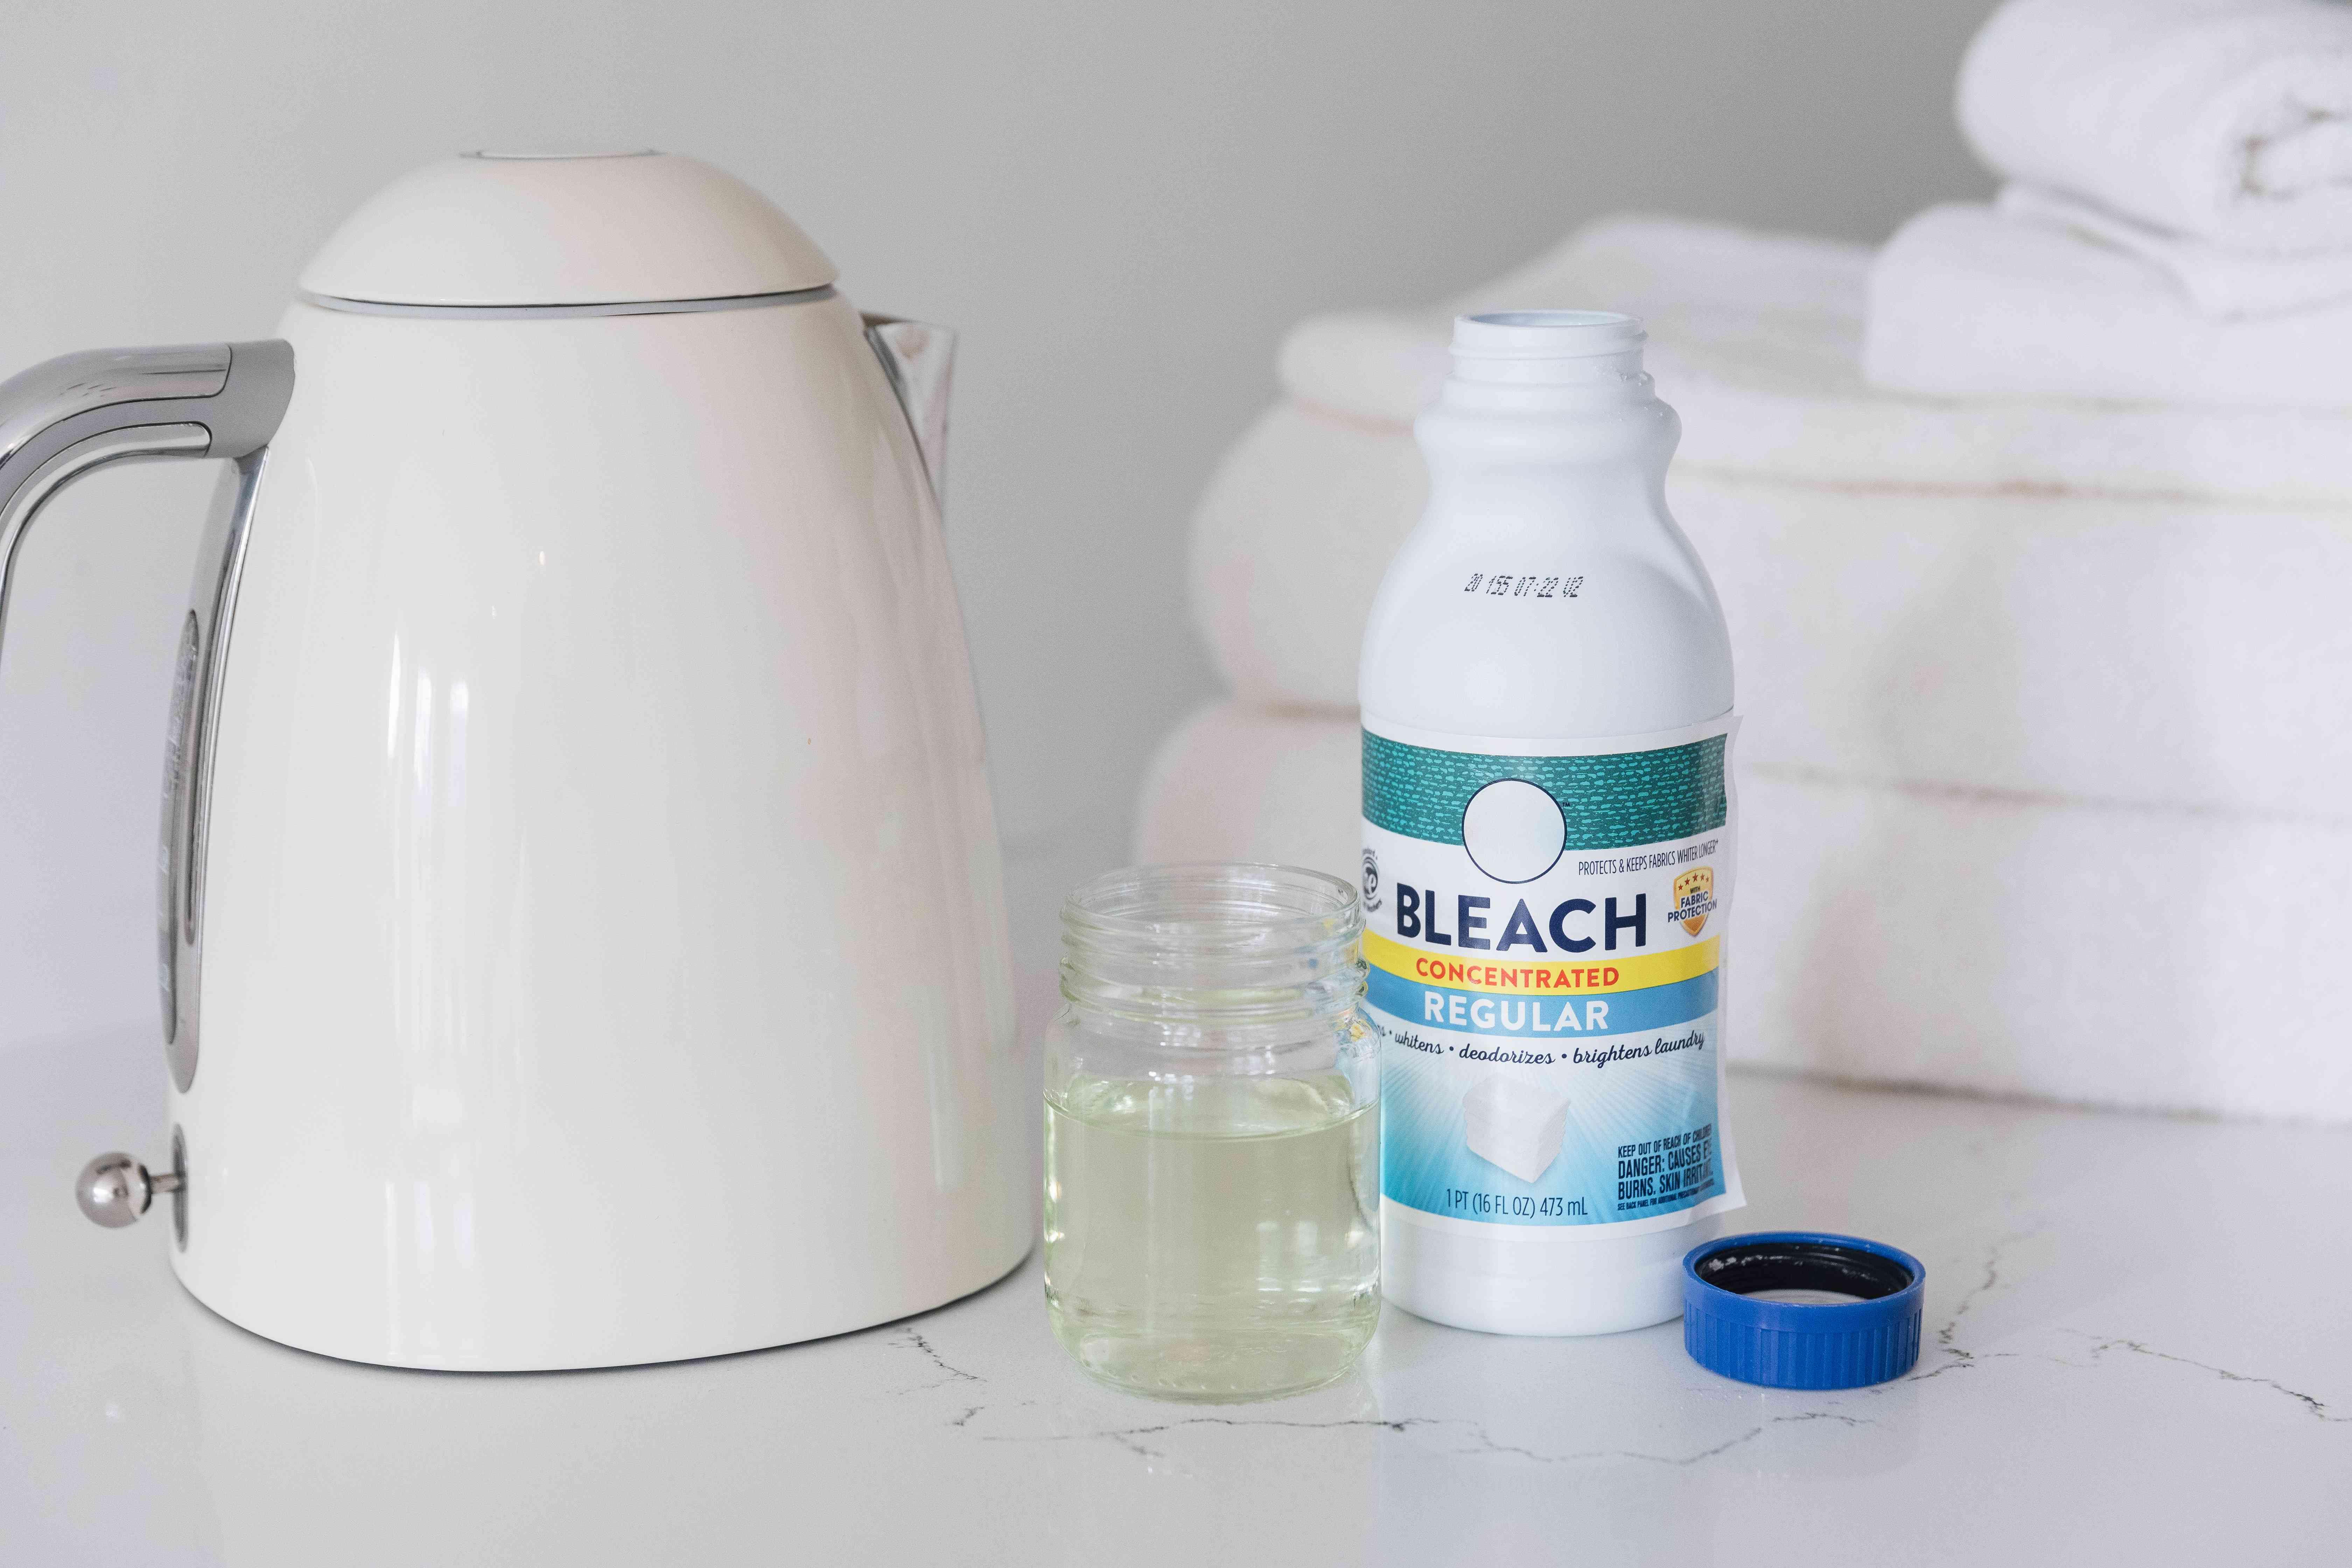 kettle next to bleach